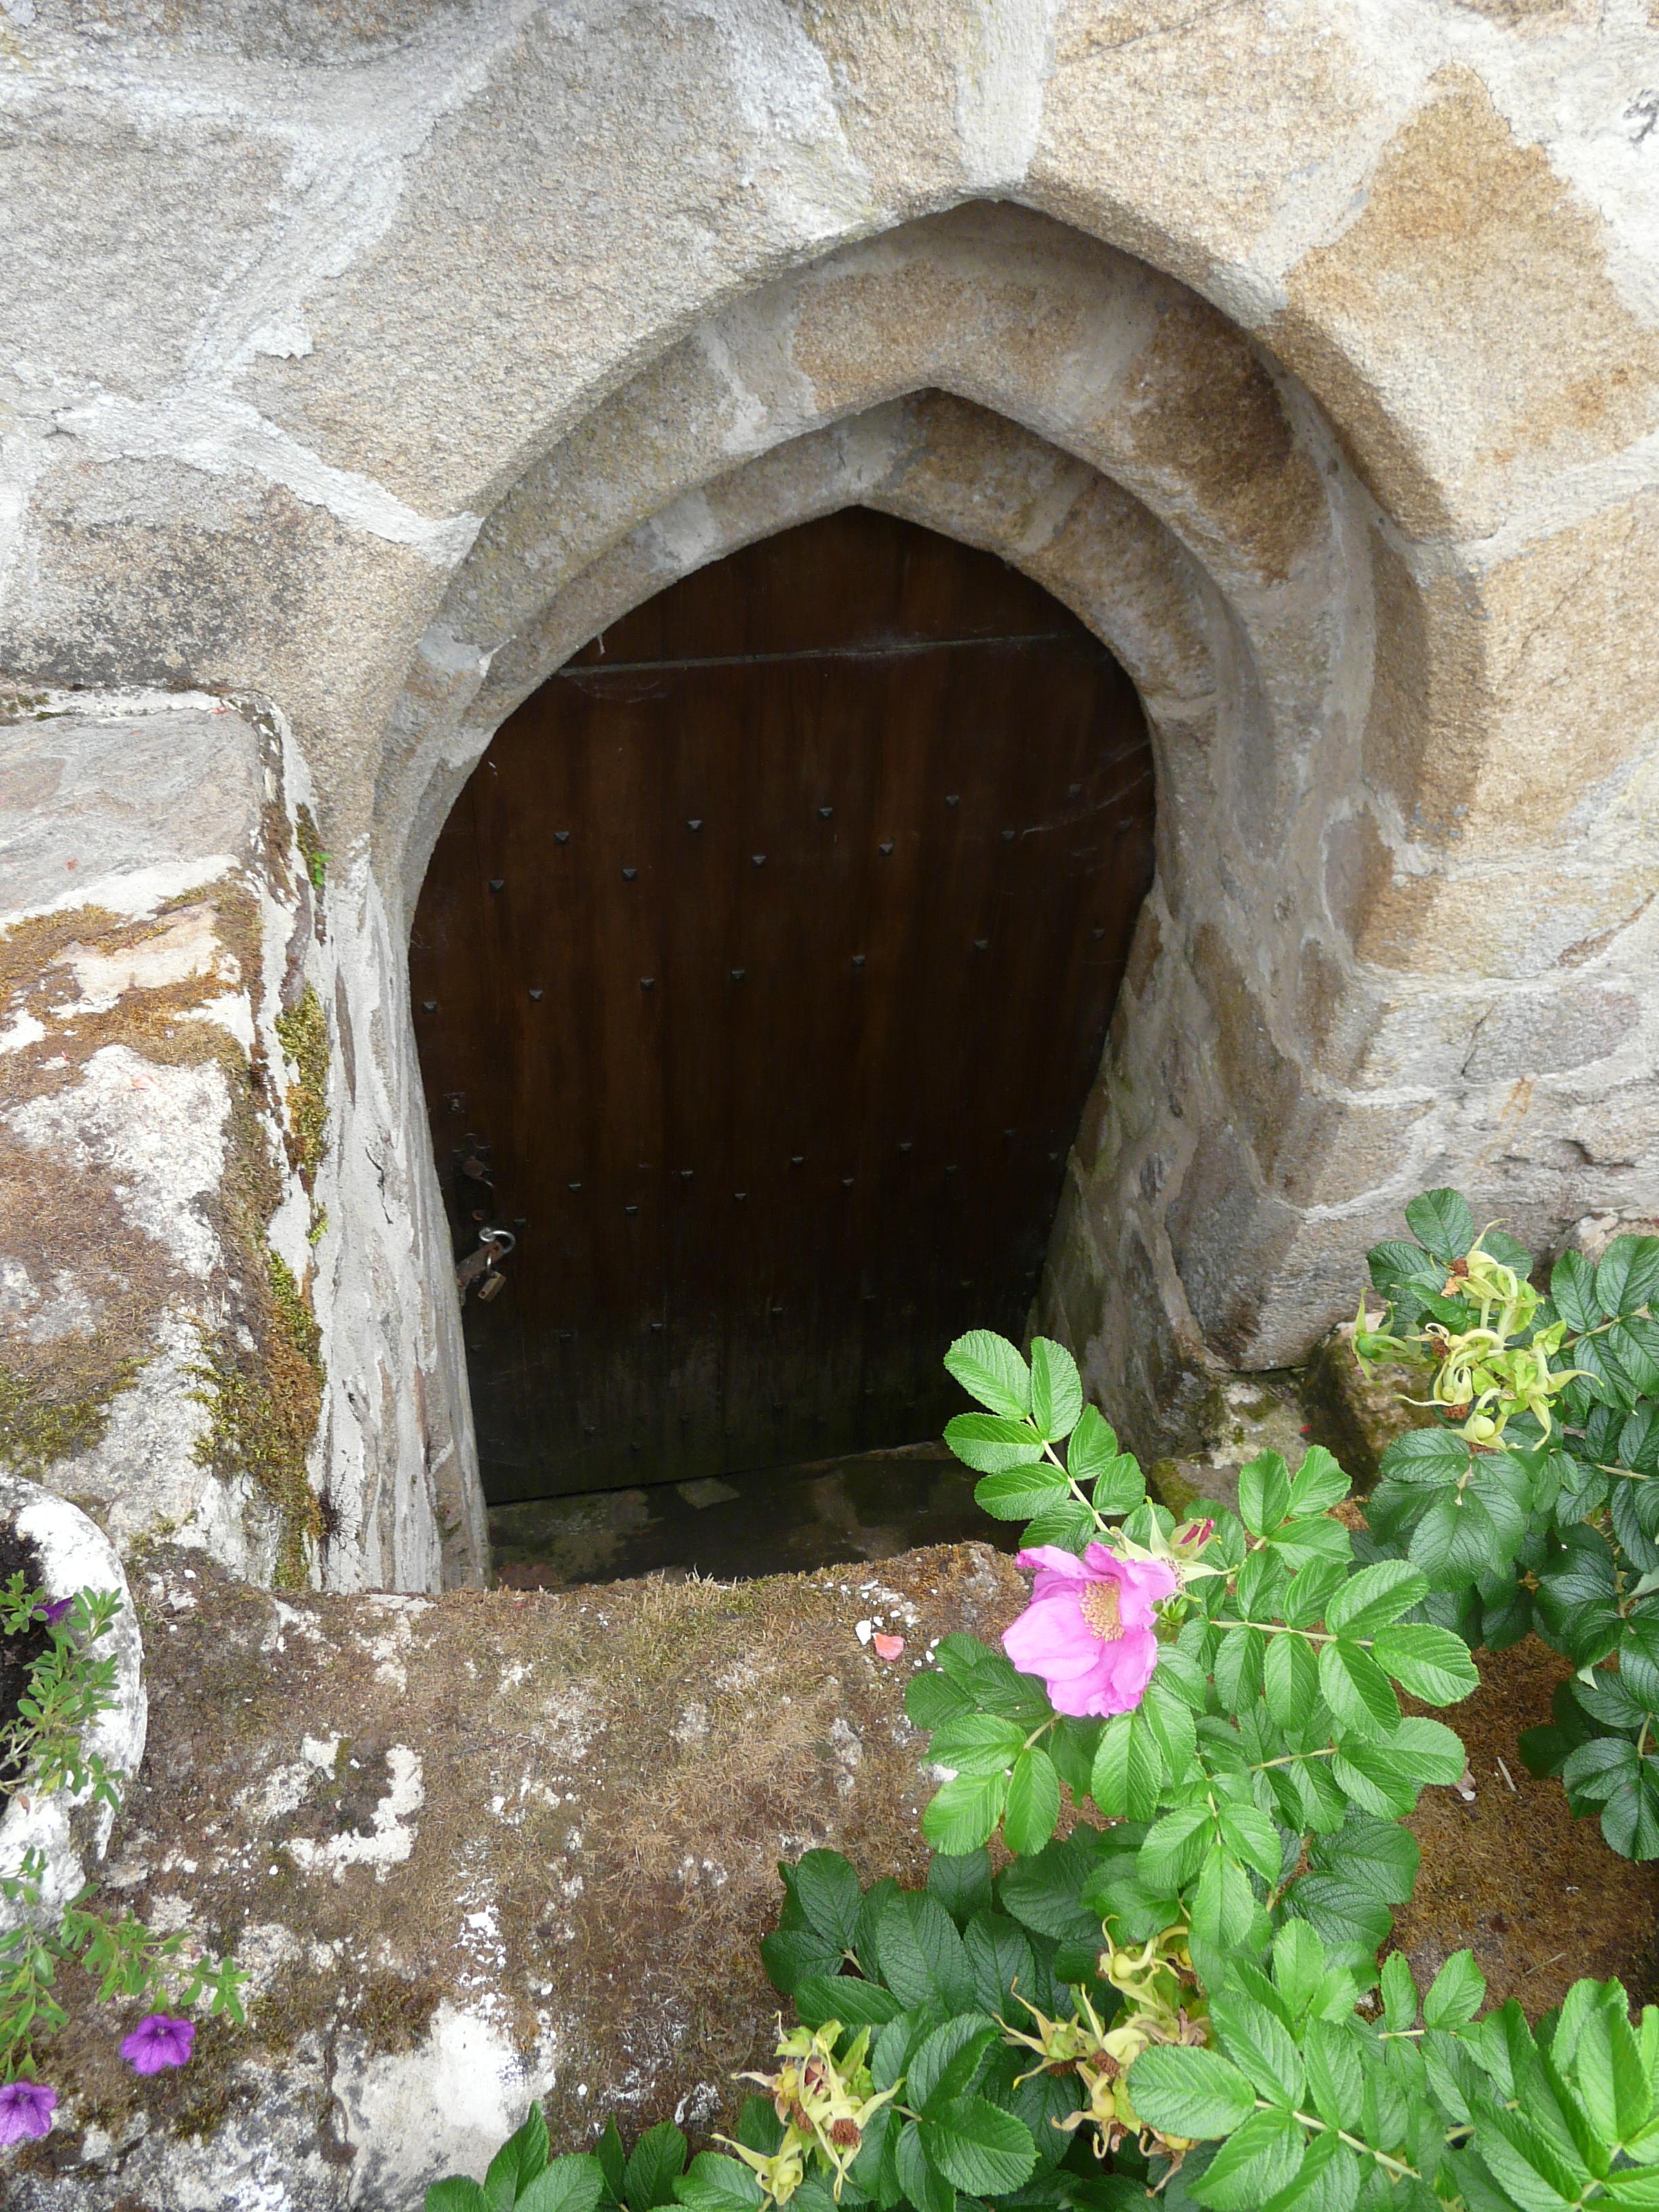 File:Le Chalard maison Anglais porte sous-sol (9).JPG - Wikimedia